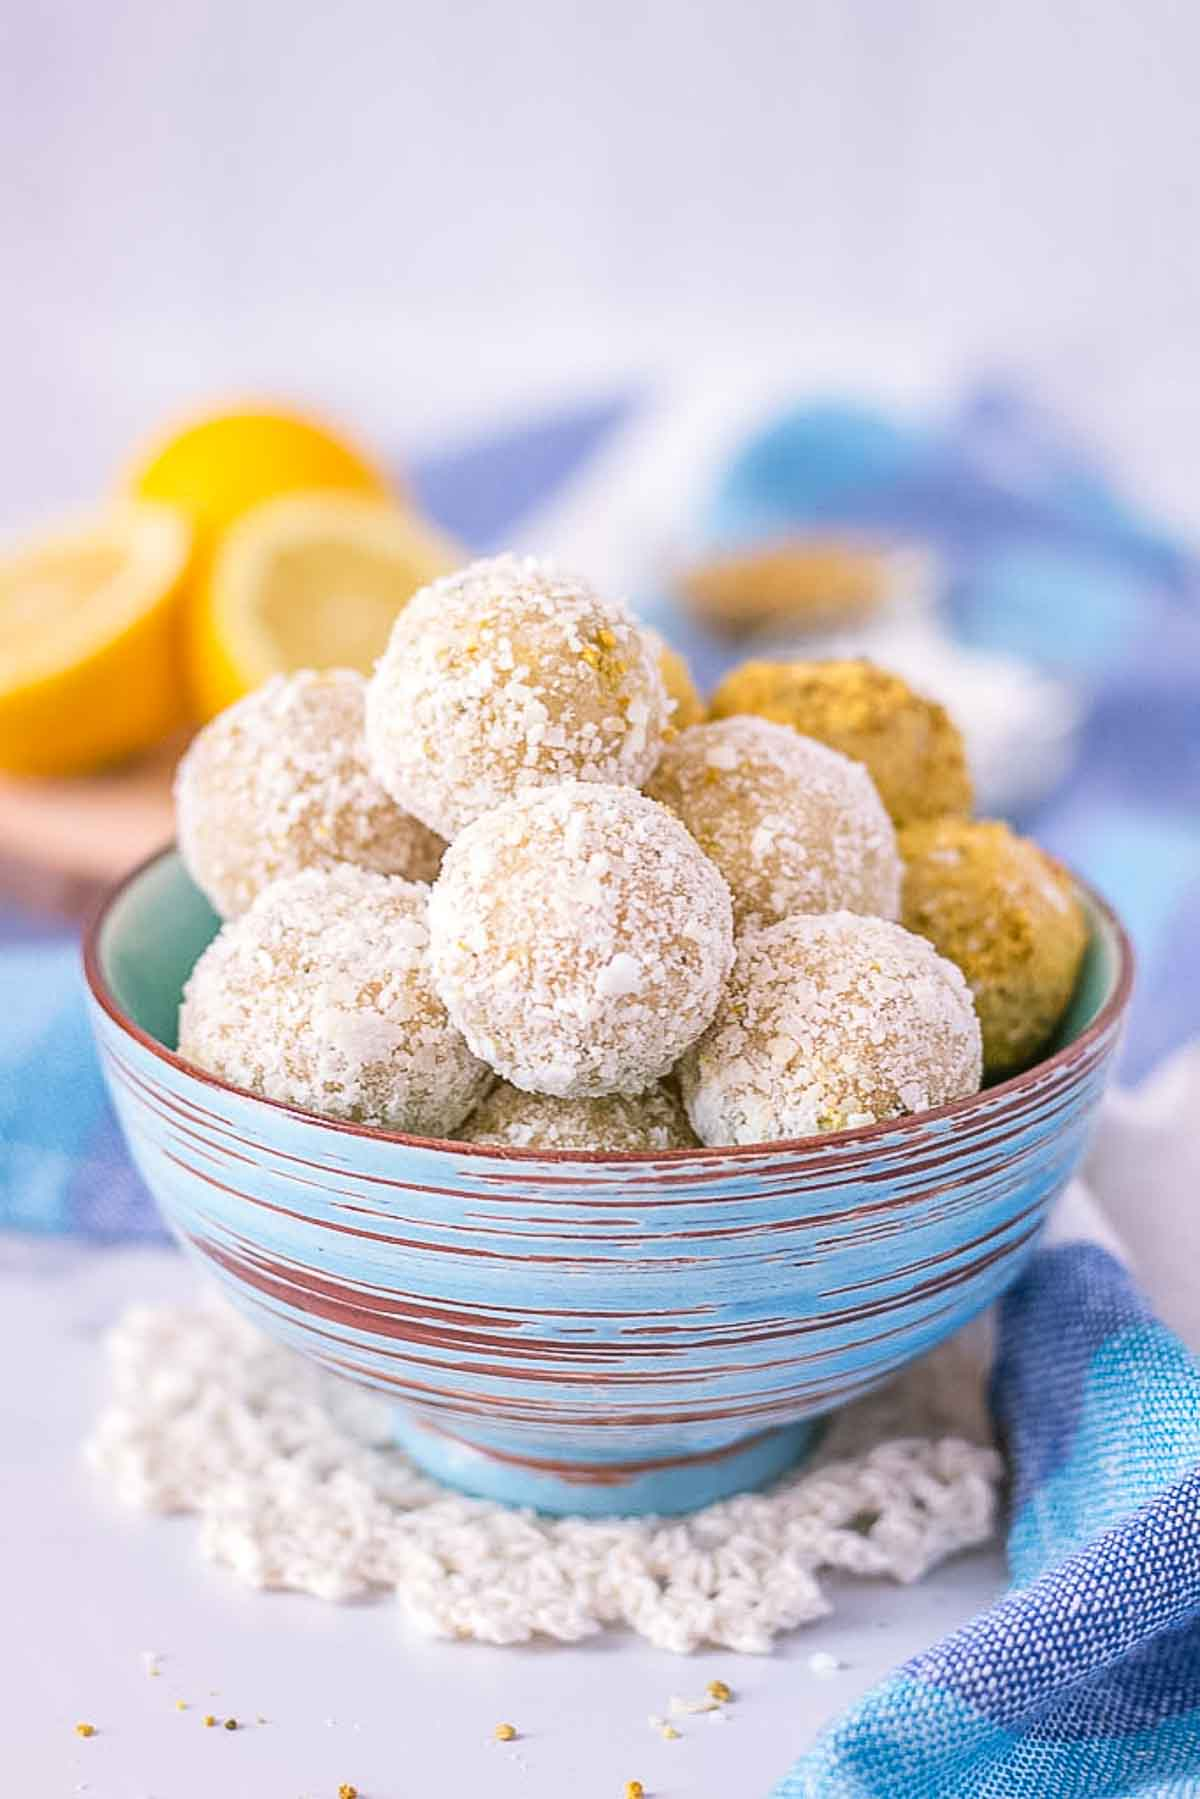 Lemon Coconut Energy Balls served in a bowl